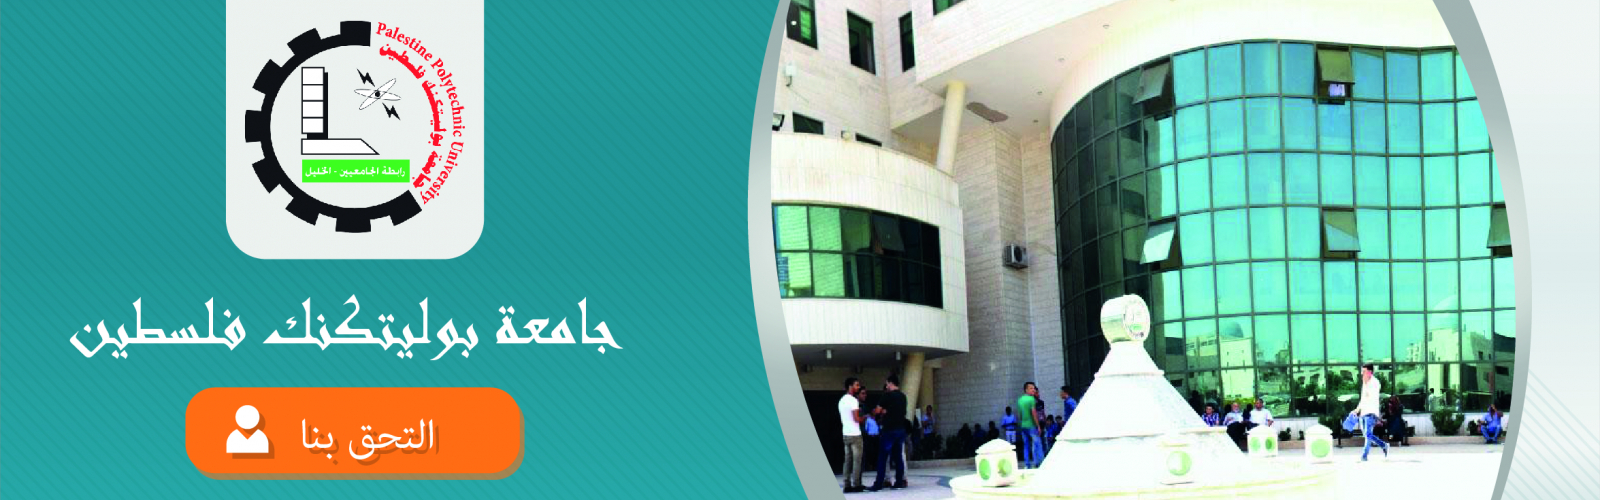 Palestine Polytechnic University (PPU) - التحق بنا